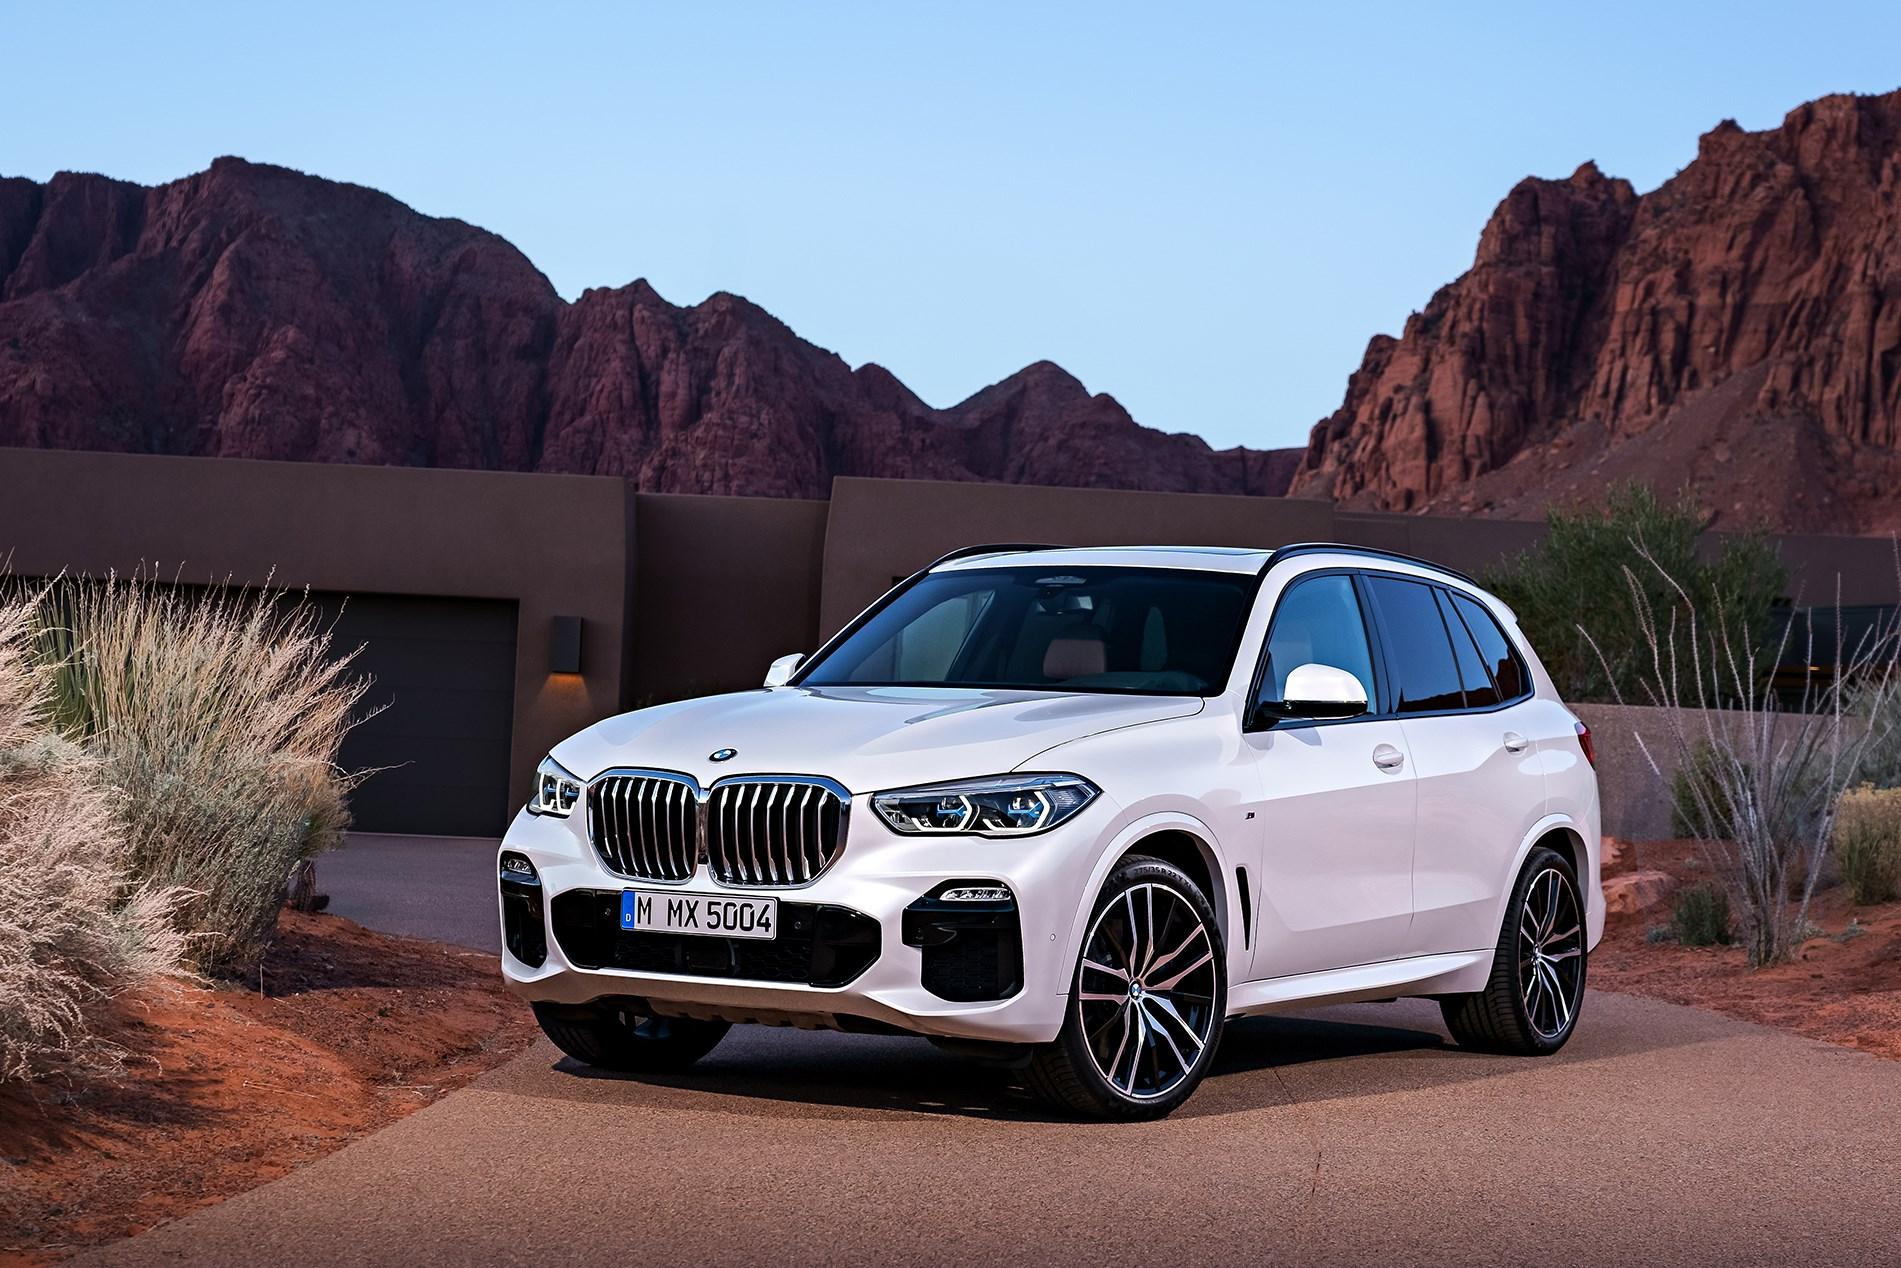 BMW、渋滞時にハンドルから手を離せる自動運転車を今夏以降に導入